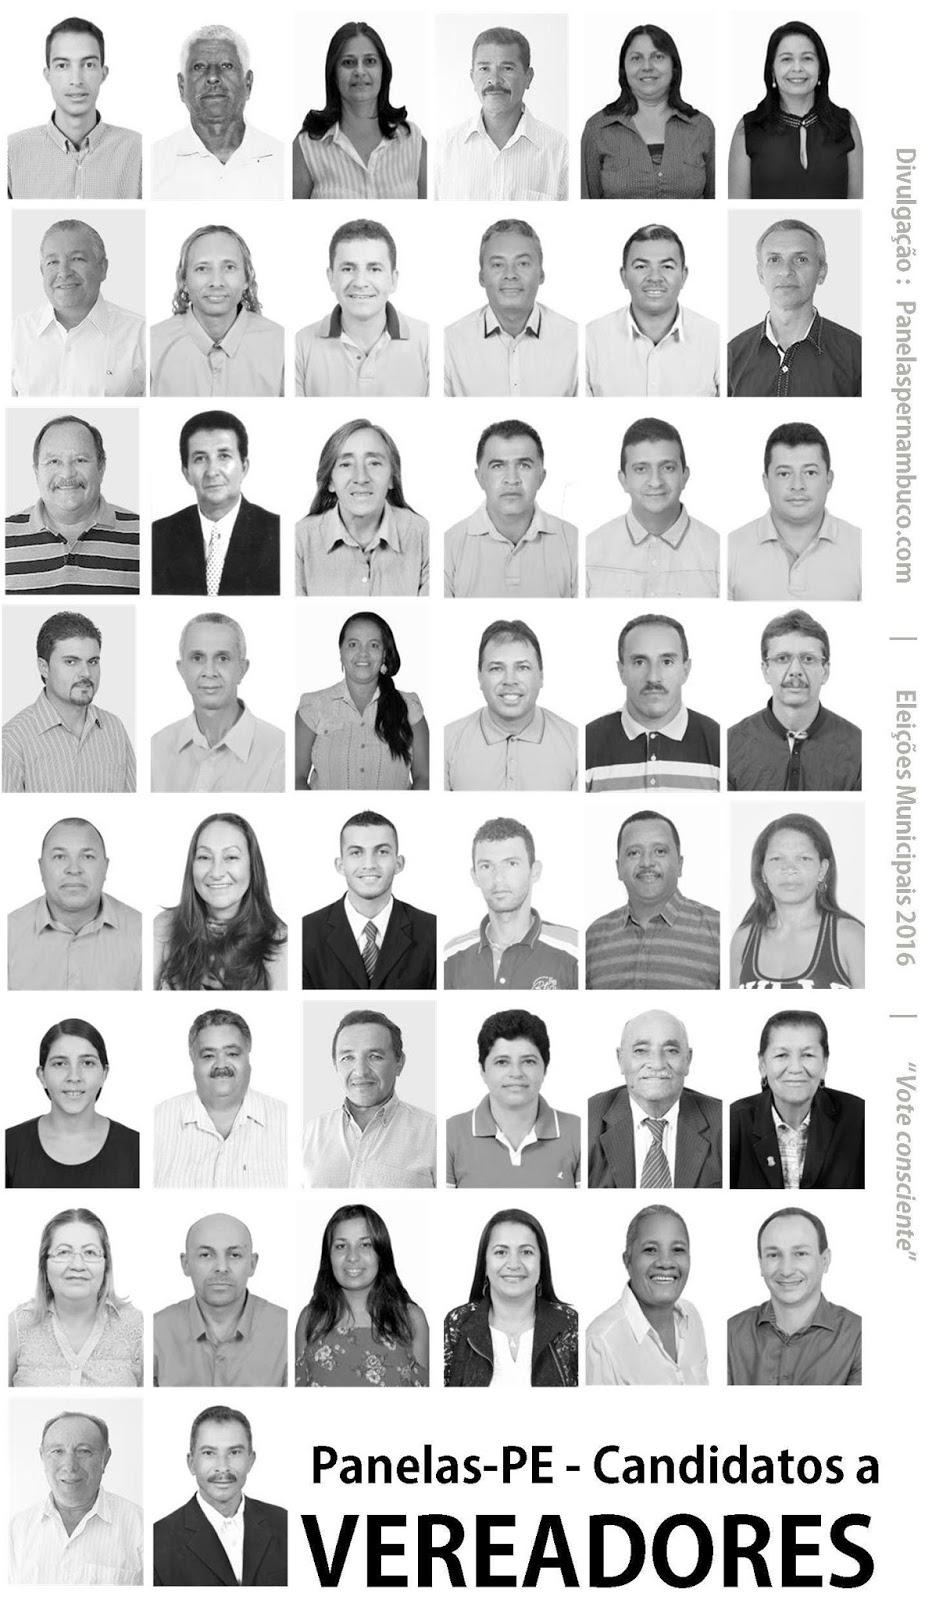 Candidatos a vereador no Município Panelas-PE nas Eleiçoes 2016